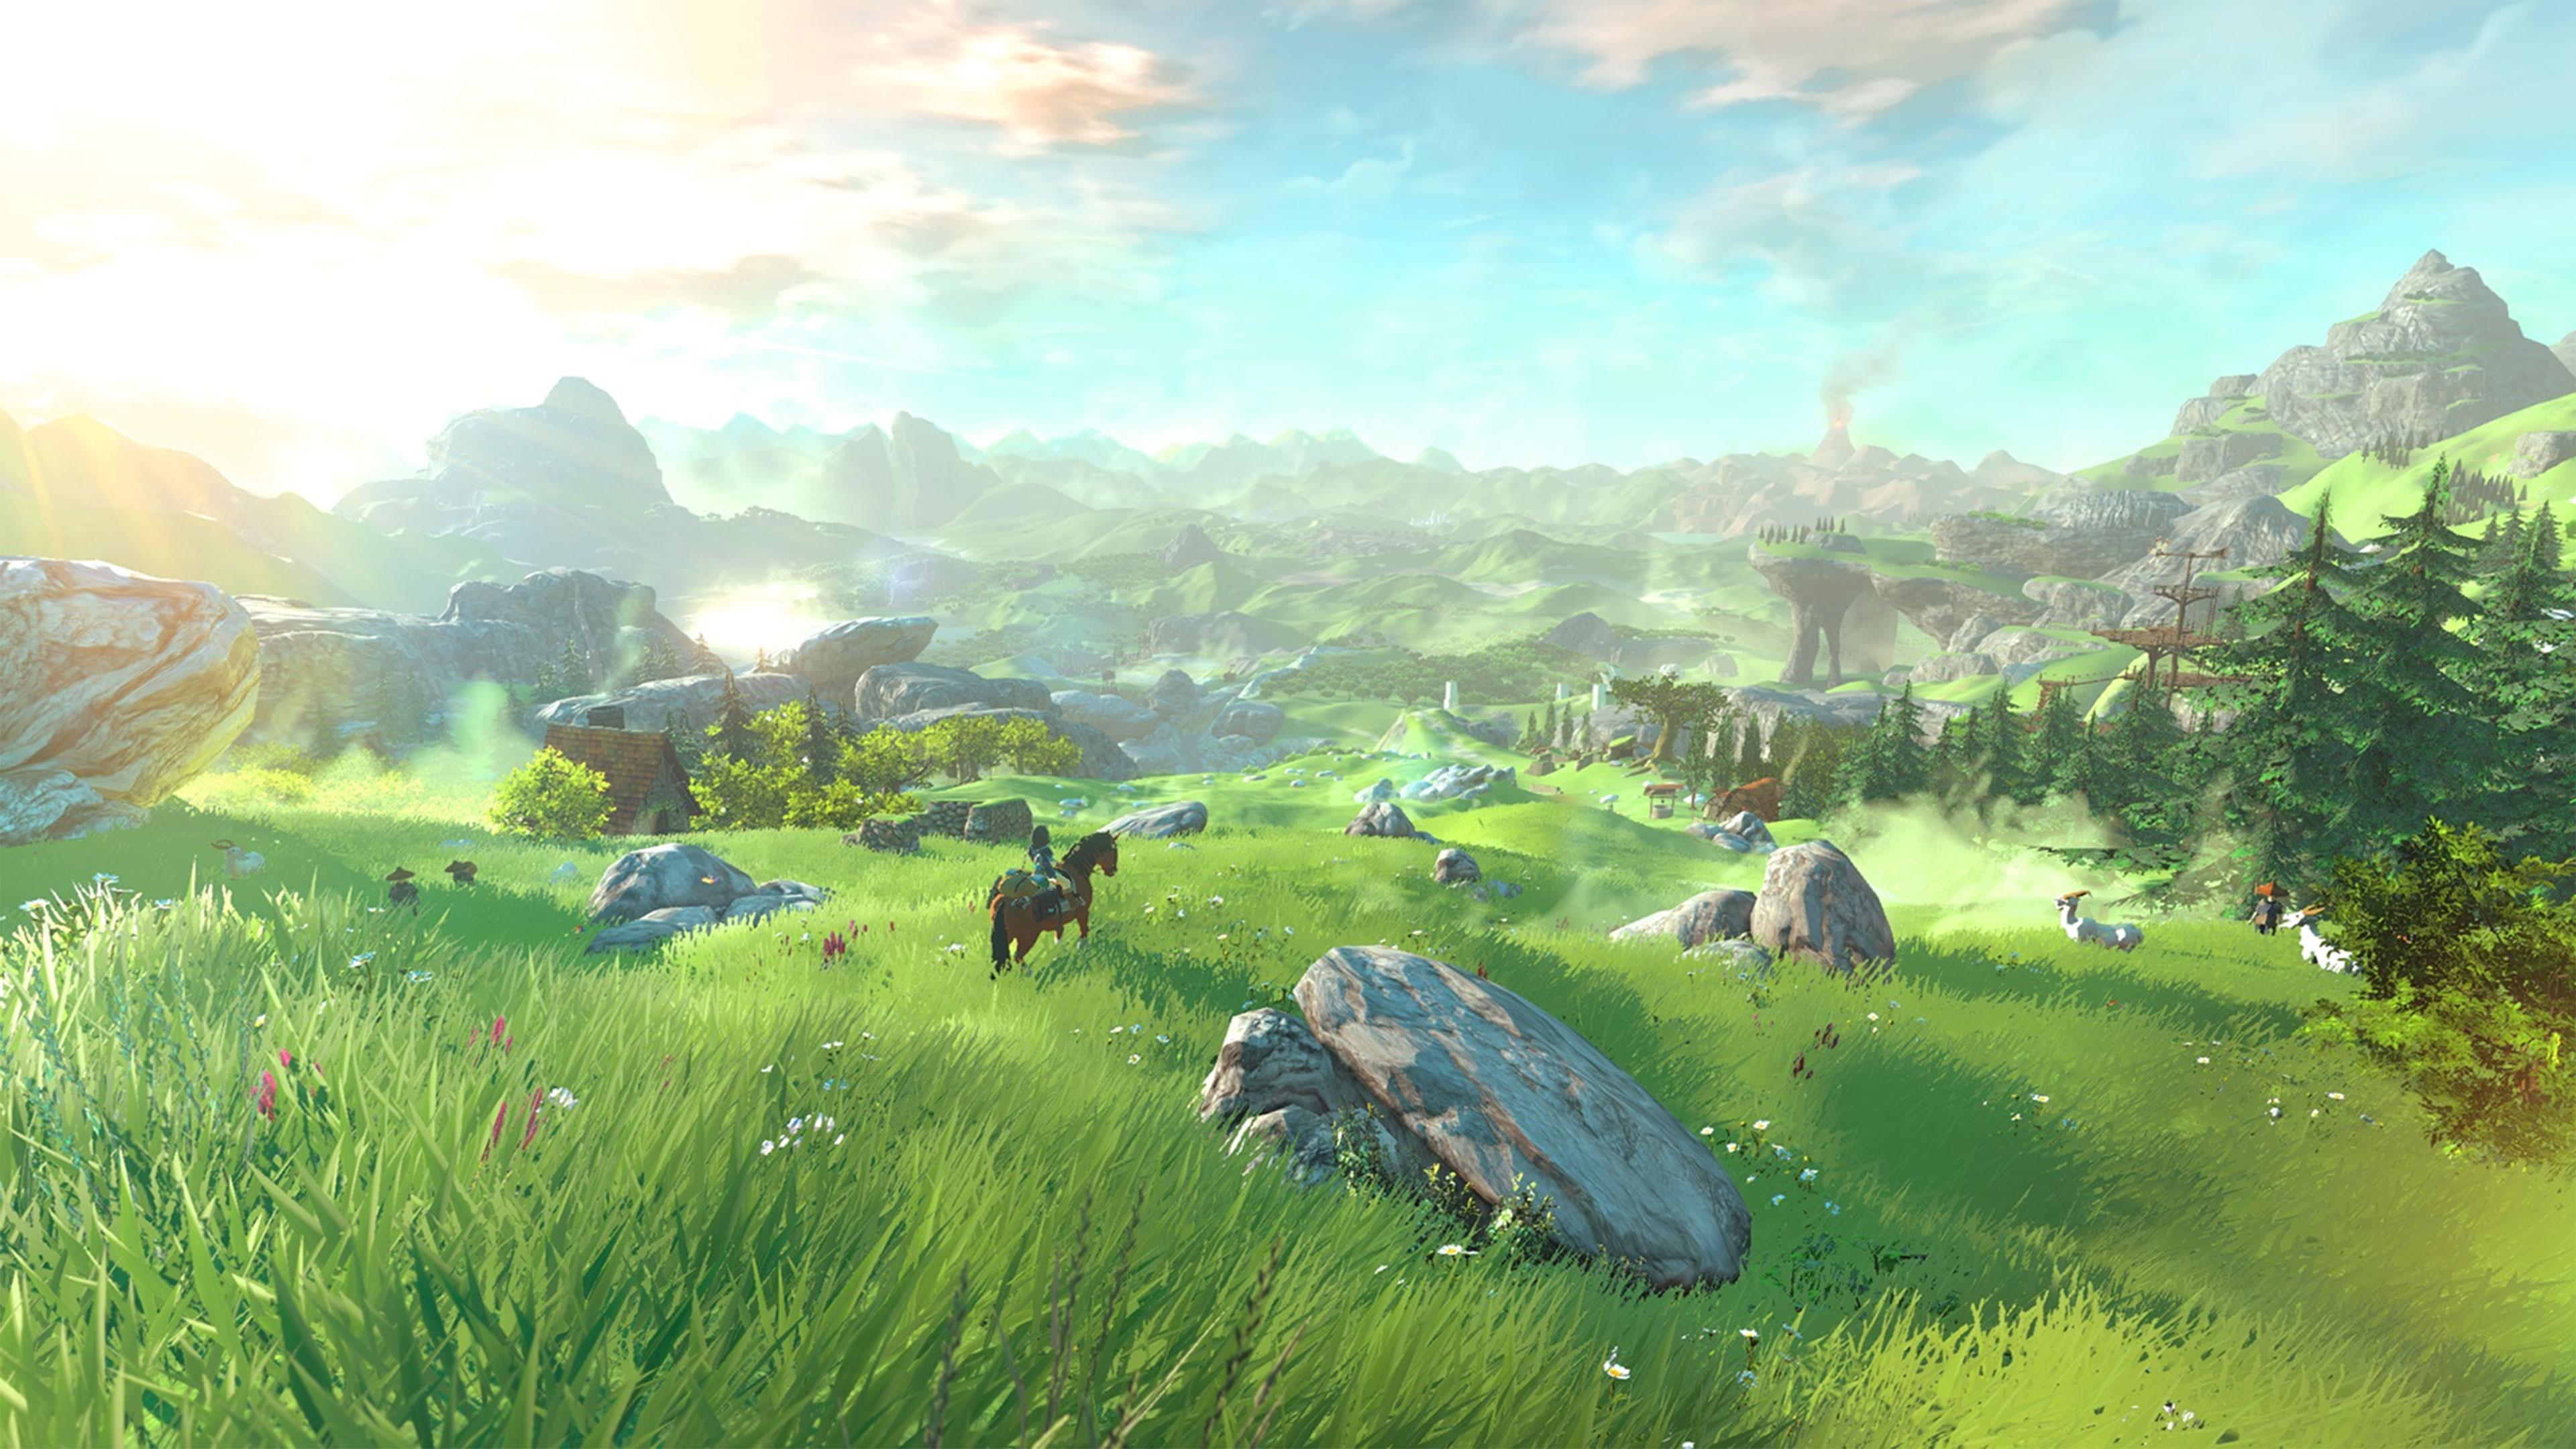 The Legend of Zelda Twilight Princess HD Wallpapers in Ultra HD 4K 3840x2160